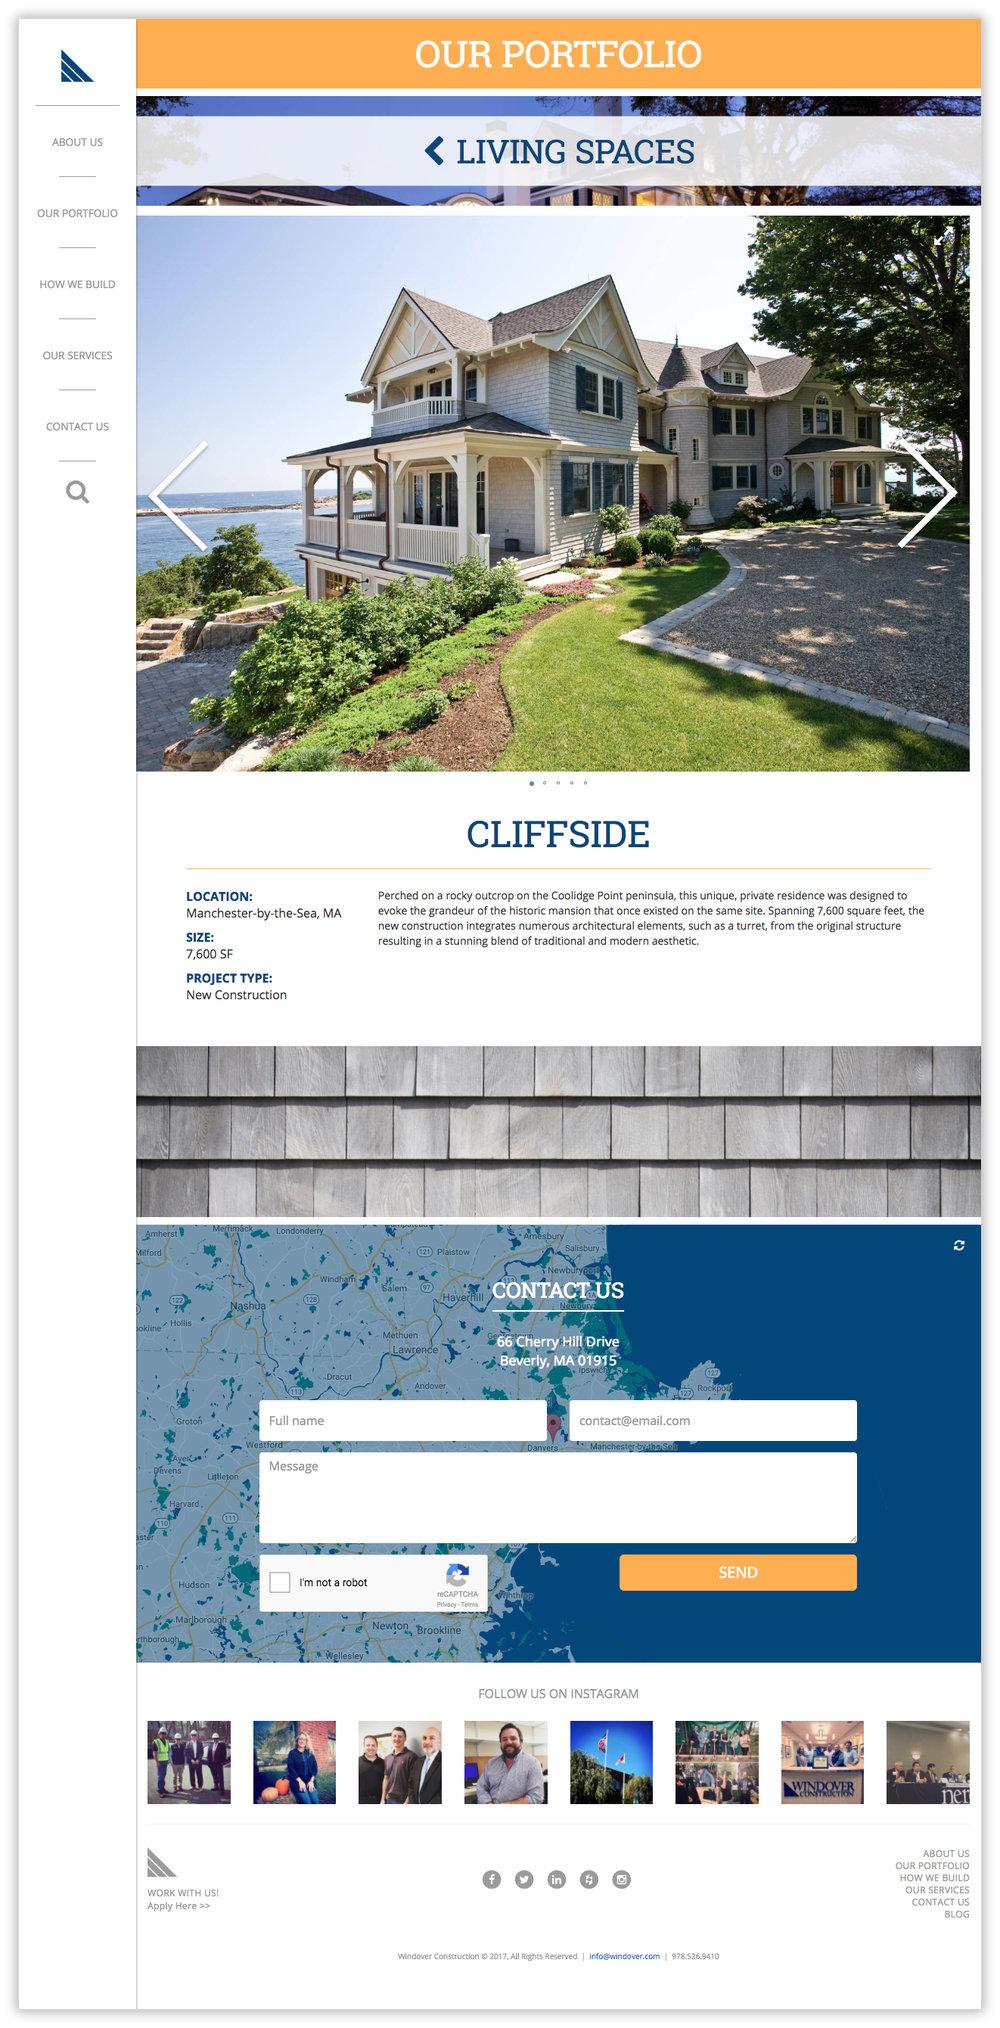 screencapture-windover-portfolio-living-spaces-cliffside-1508898316974.jpg